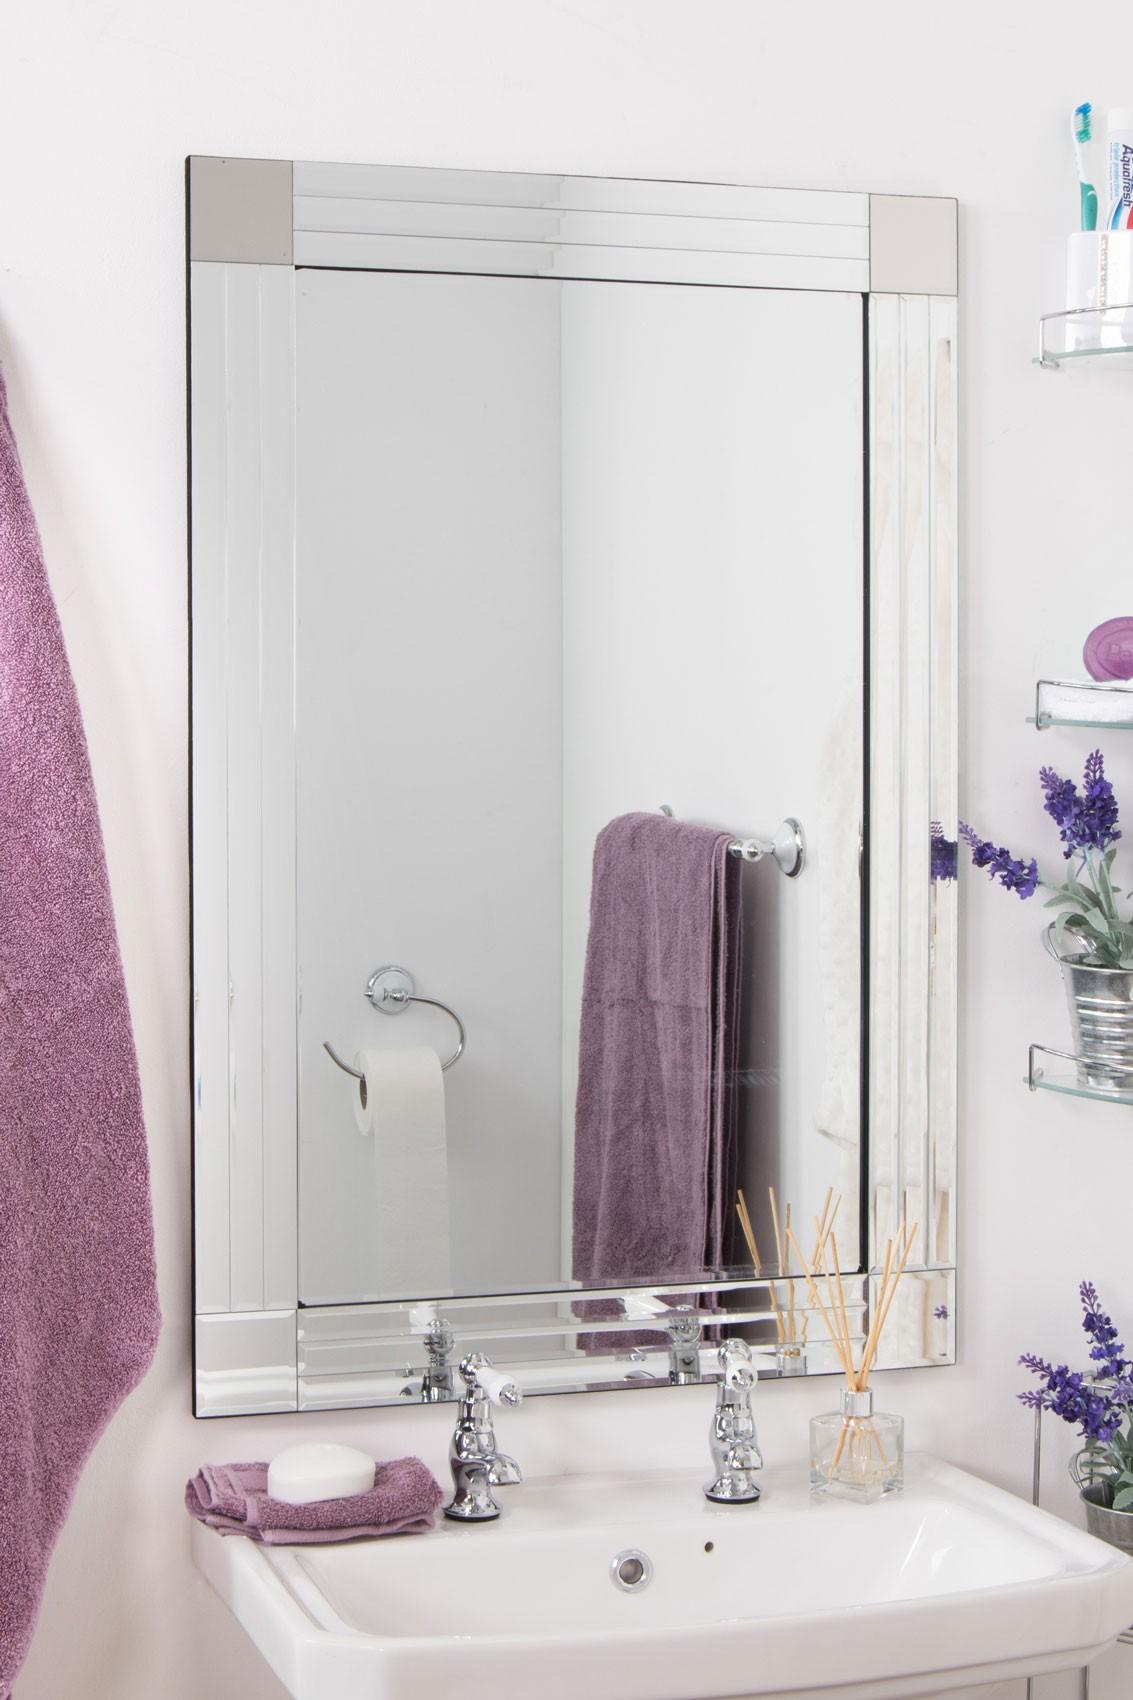 Silver triple bevelled venetian bathroom mirror 3ft x 2ft 91cm x 61cm undo 5055781821097 ebay for Bevelled edge bathroom mirror